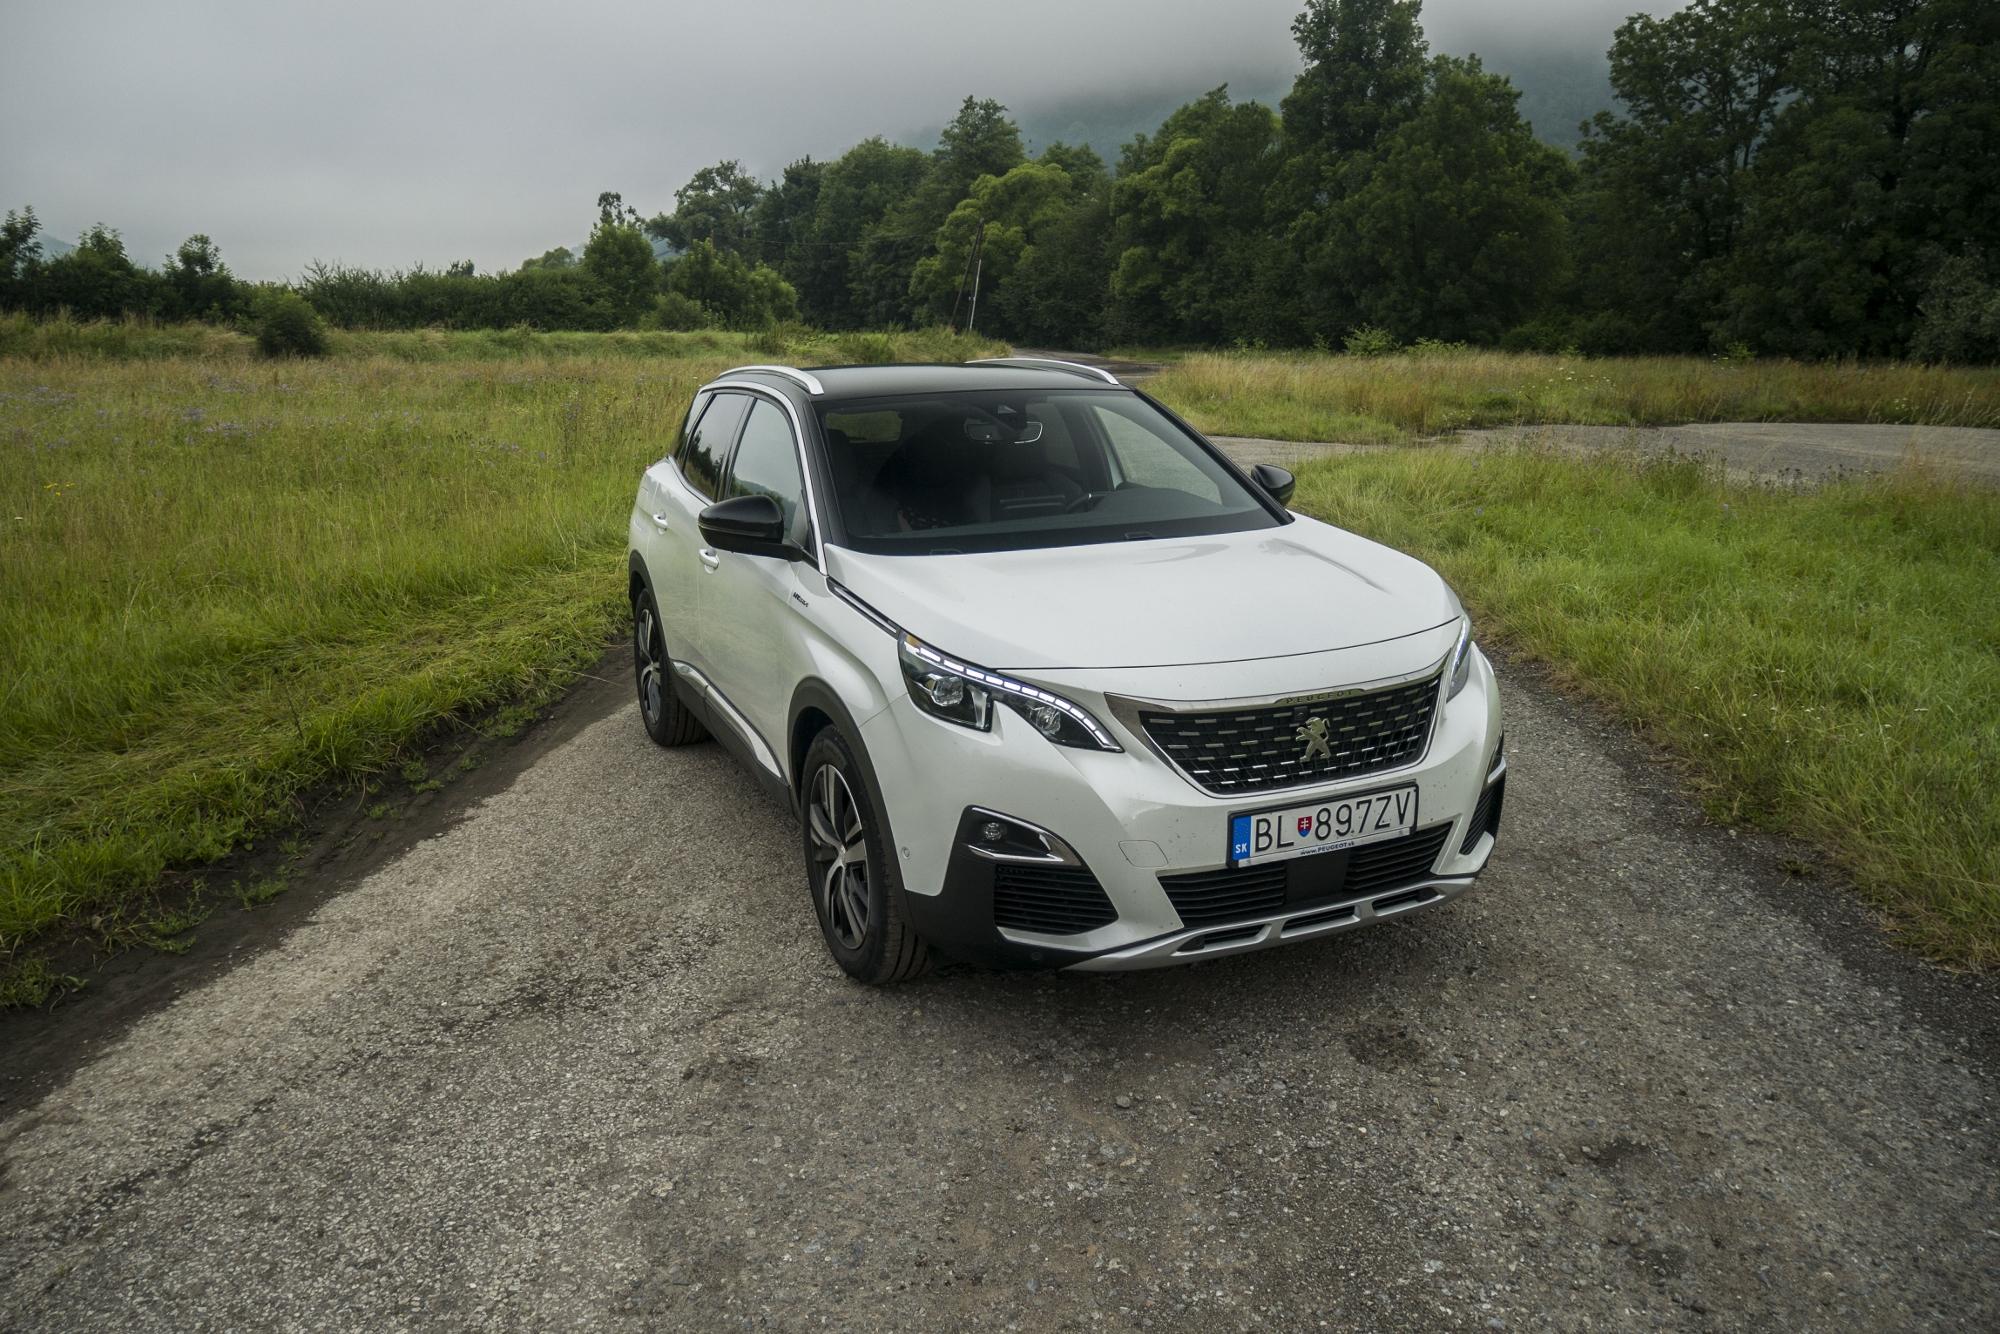 Test: Peugeot 3008 posúva schopnosti plug in hybridov pgnrZy6iqv peugeot-3008-hybrid4-2